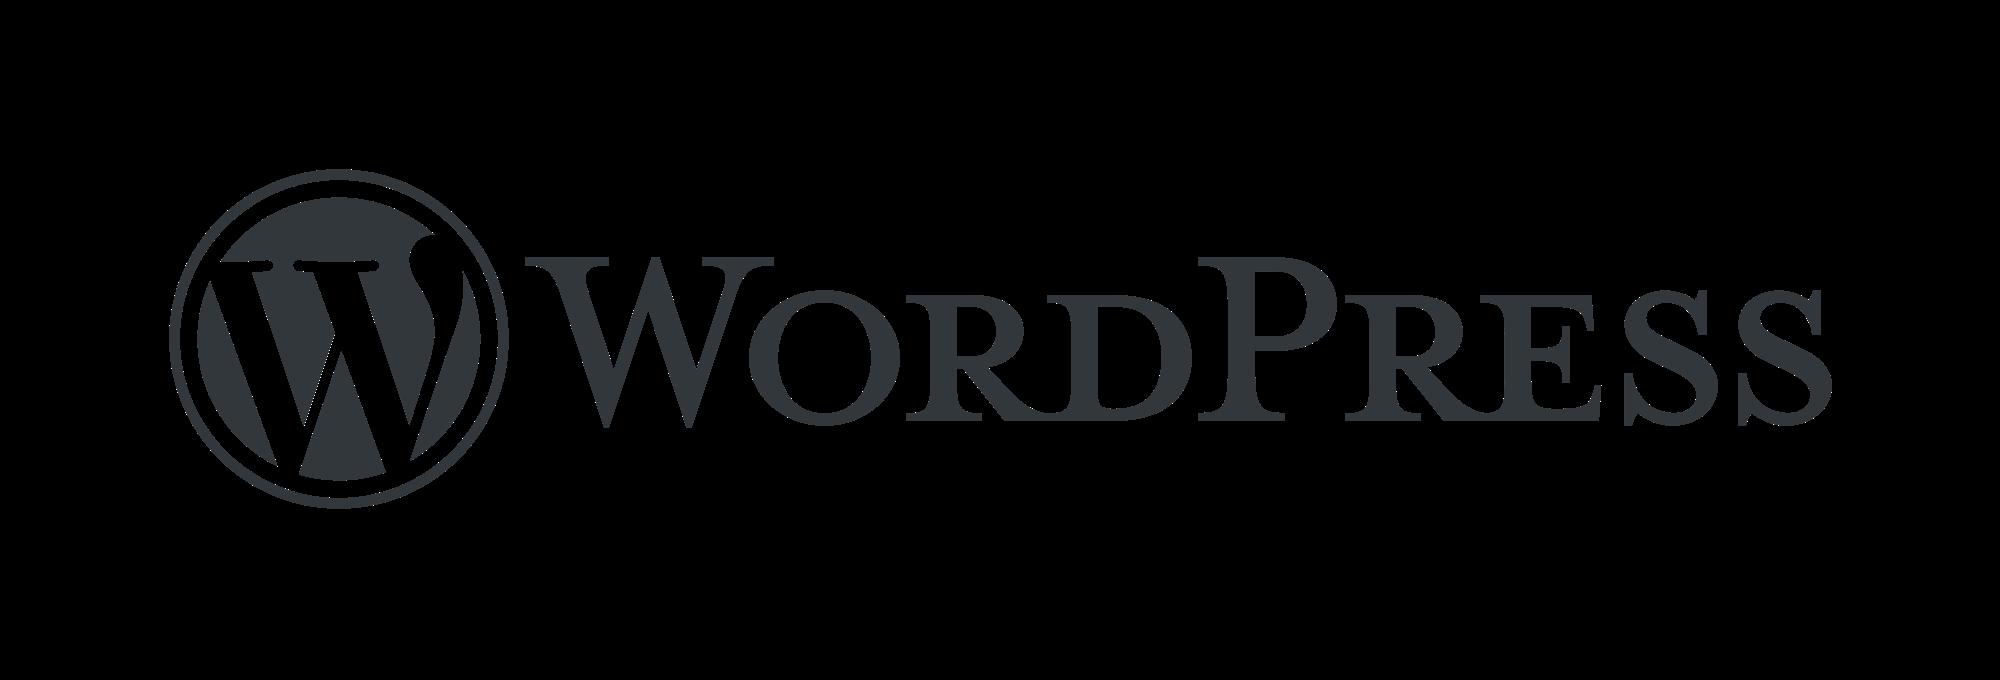 WordPress-logo_verkkosivut_pixels-helsinki